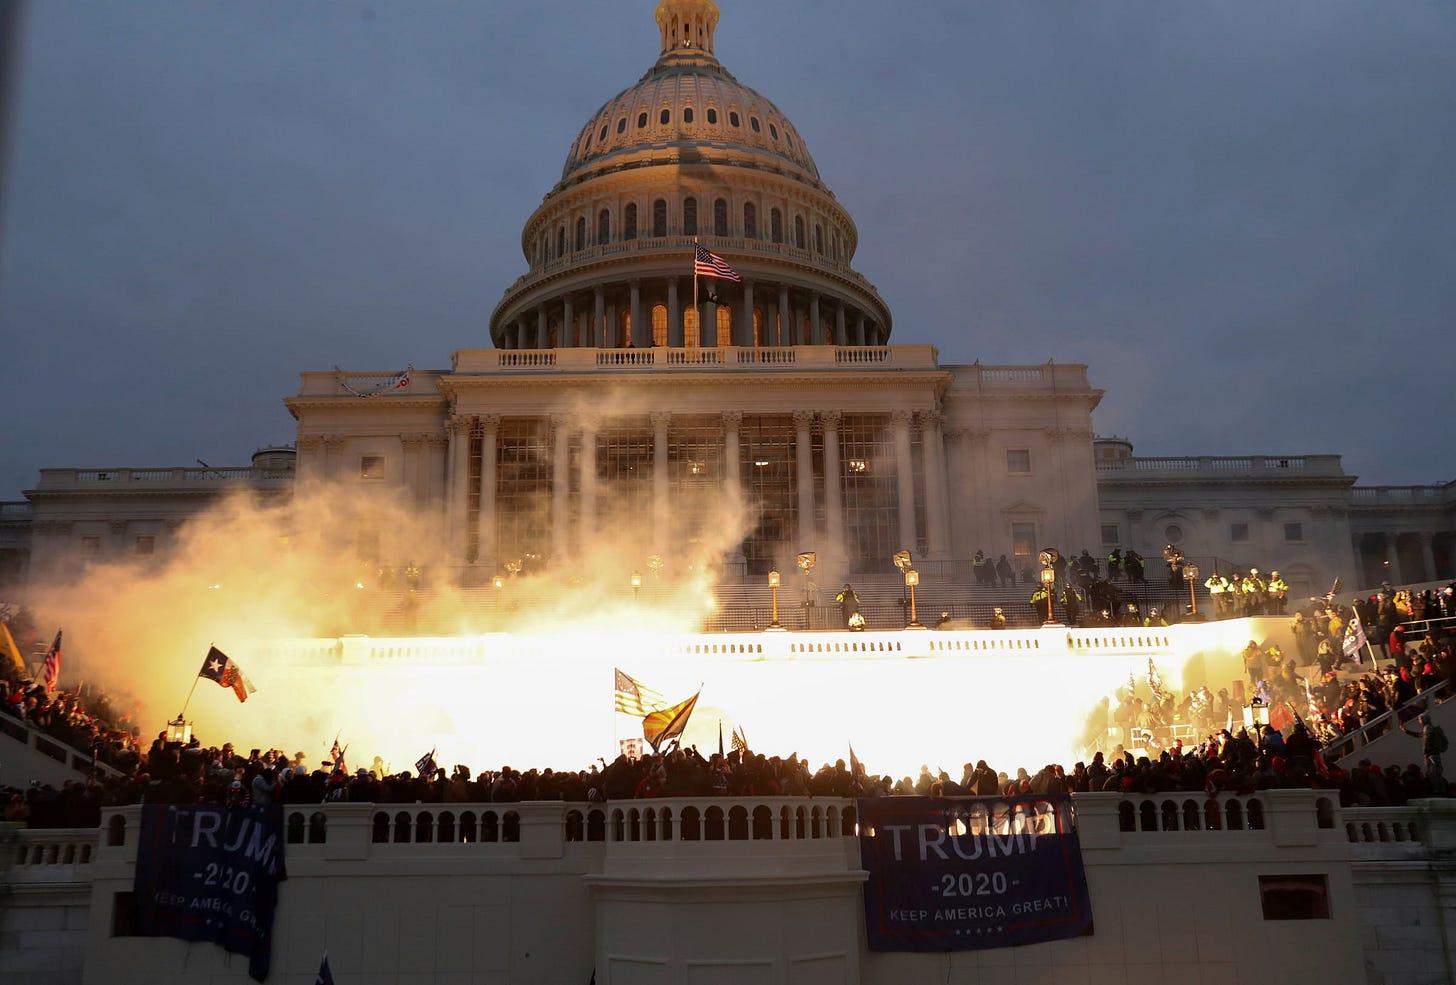 Crisis at the Capitol